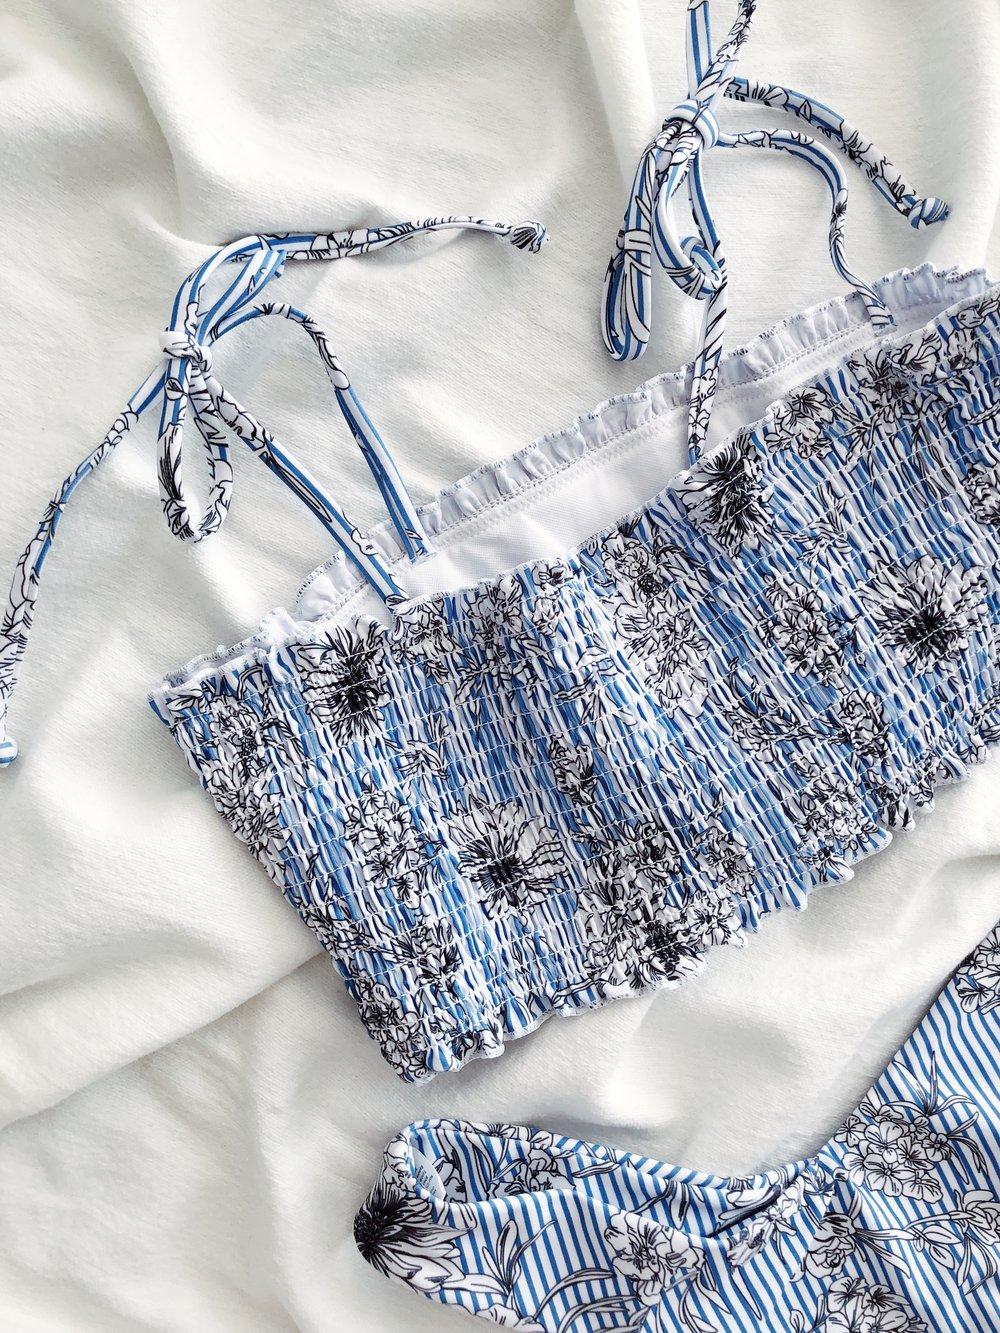 shein swimsuit bikini haul and review swimwear spring summer instagram trendy swim